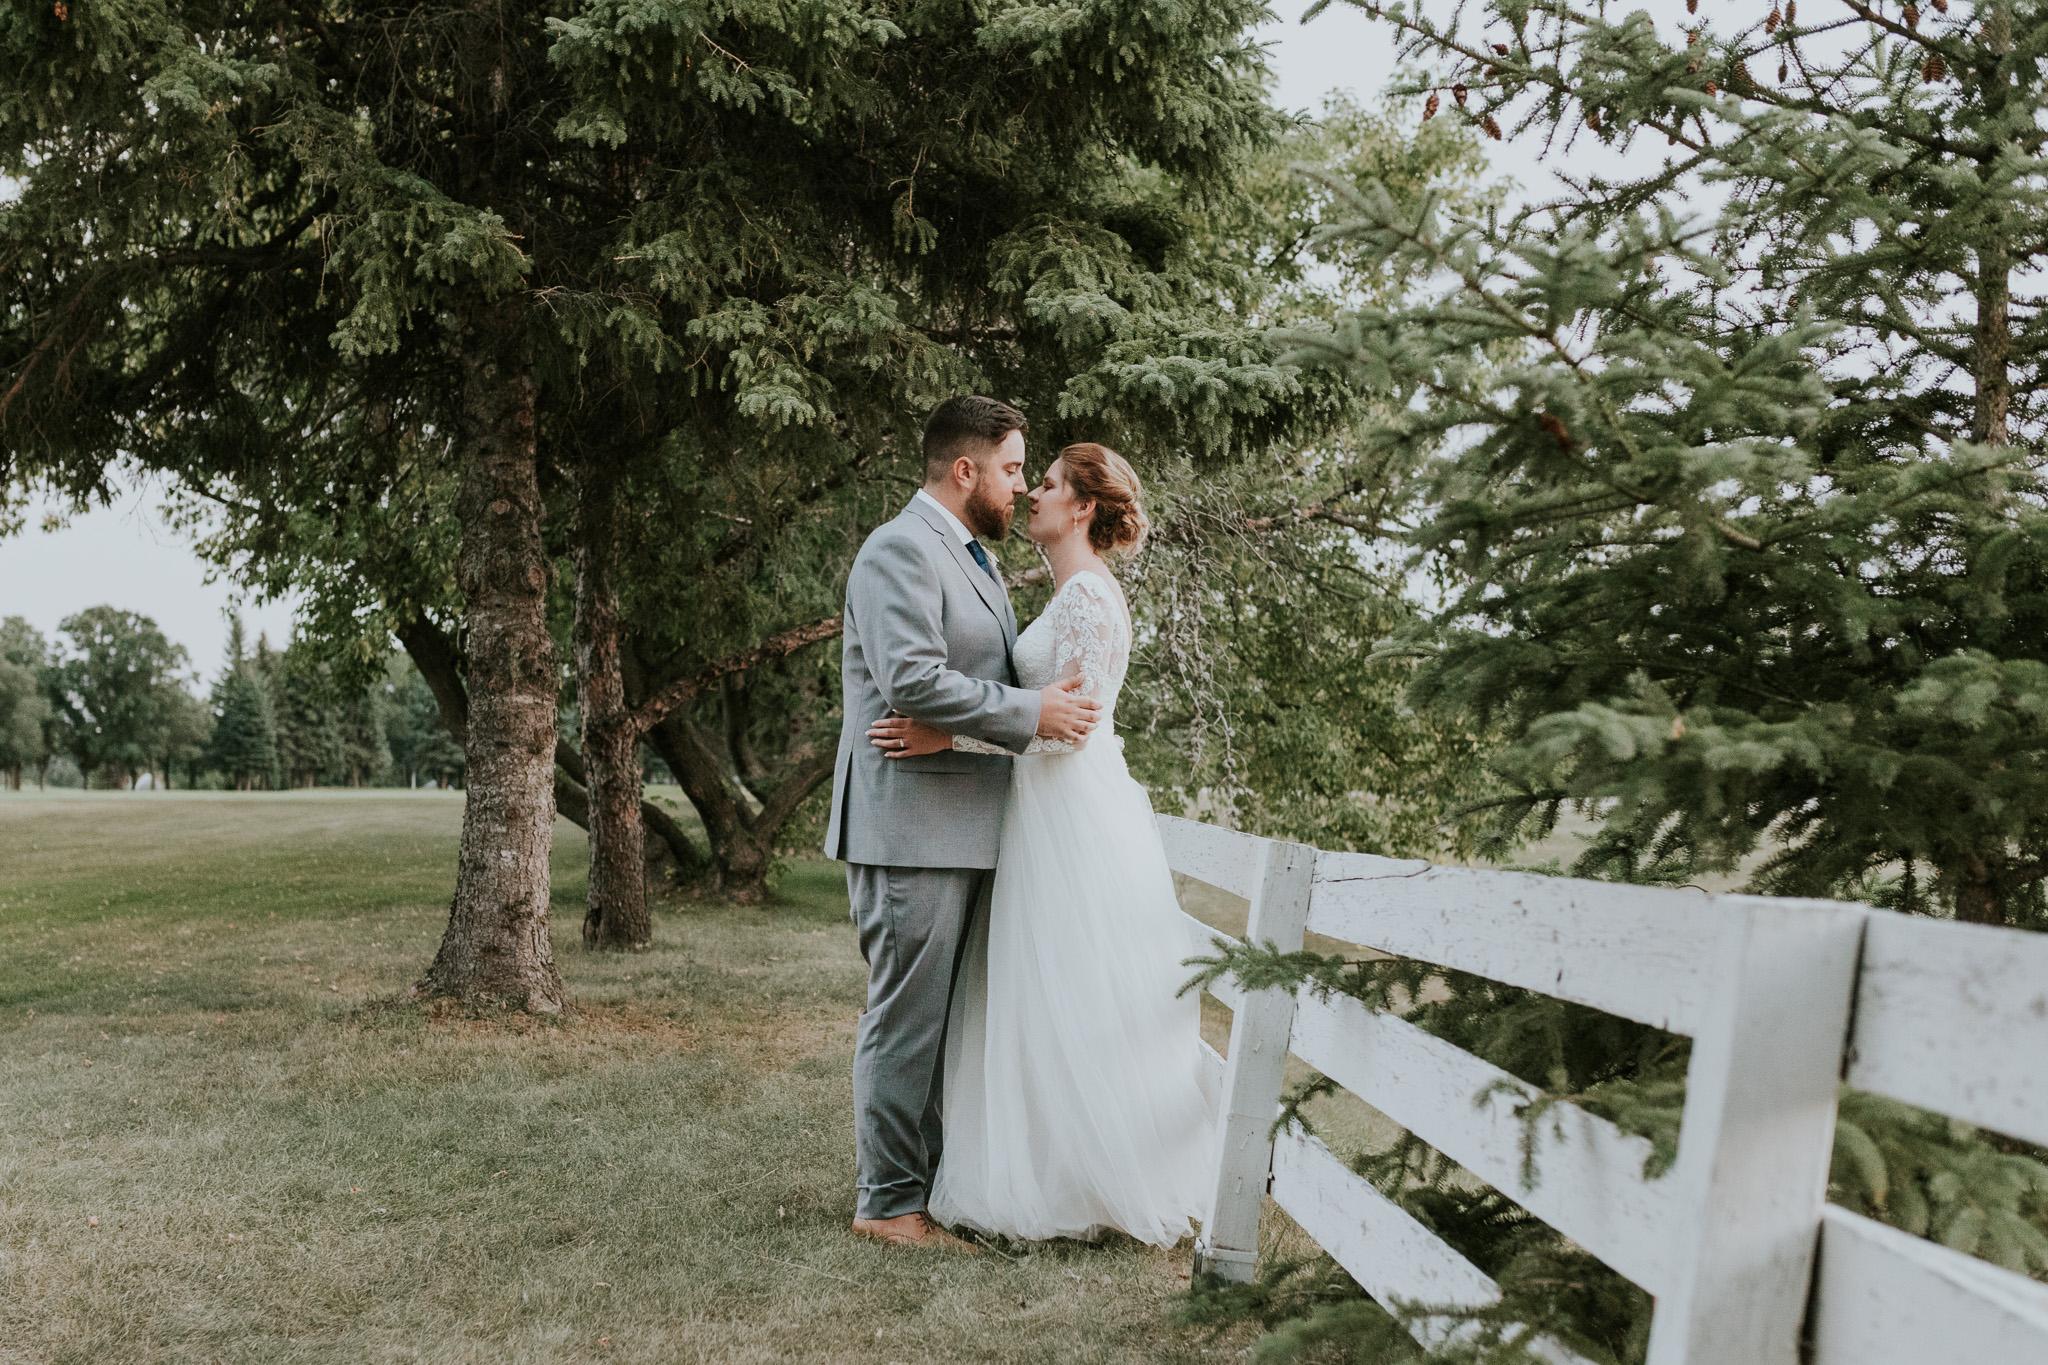 pine-ridge-golf-course-winnipeg-wedding-107.jpg